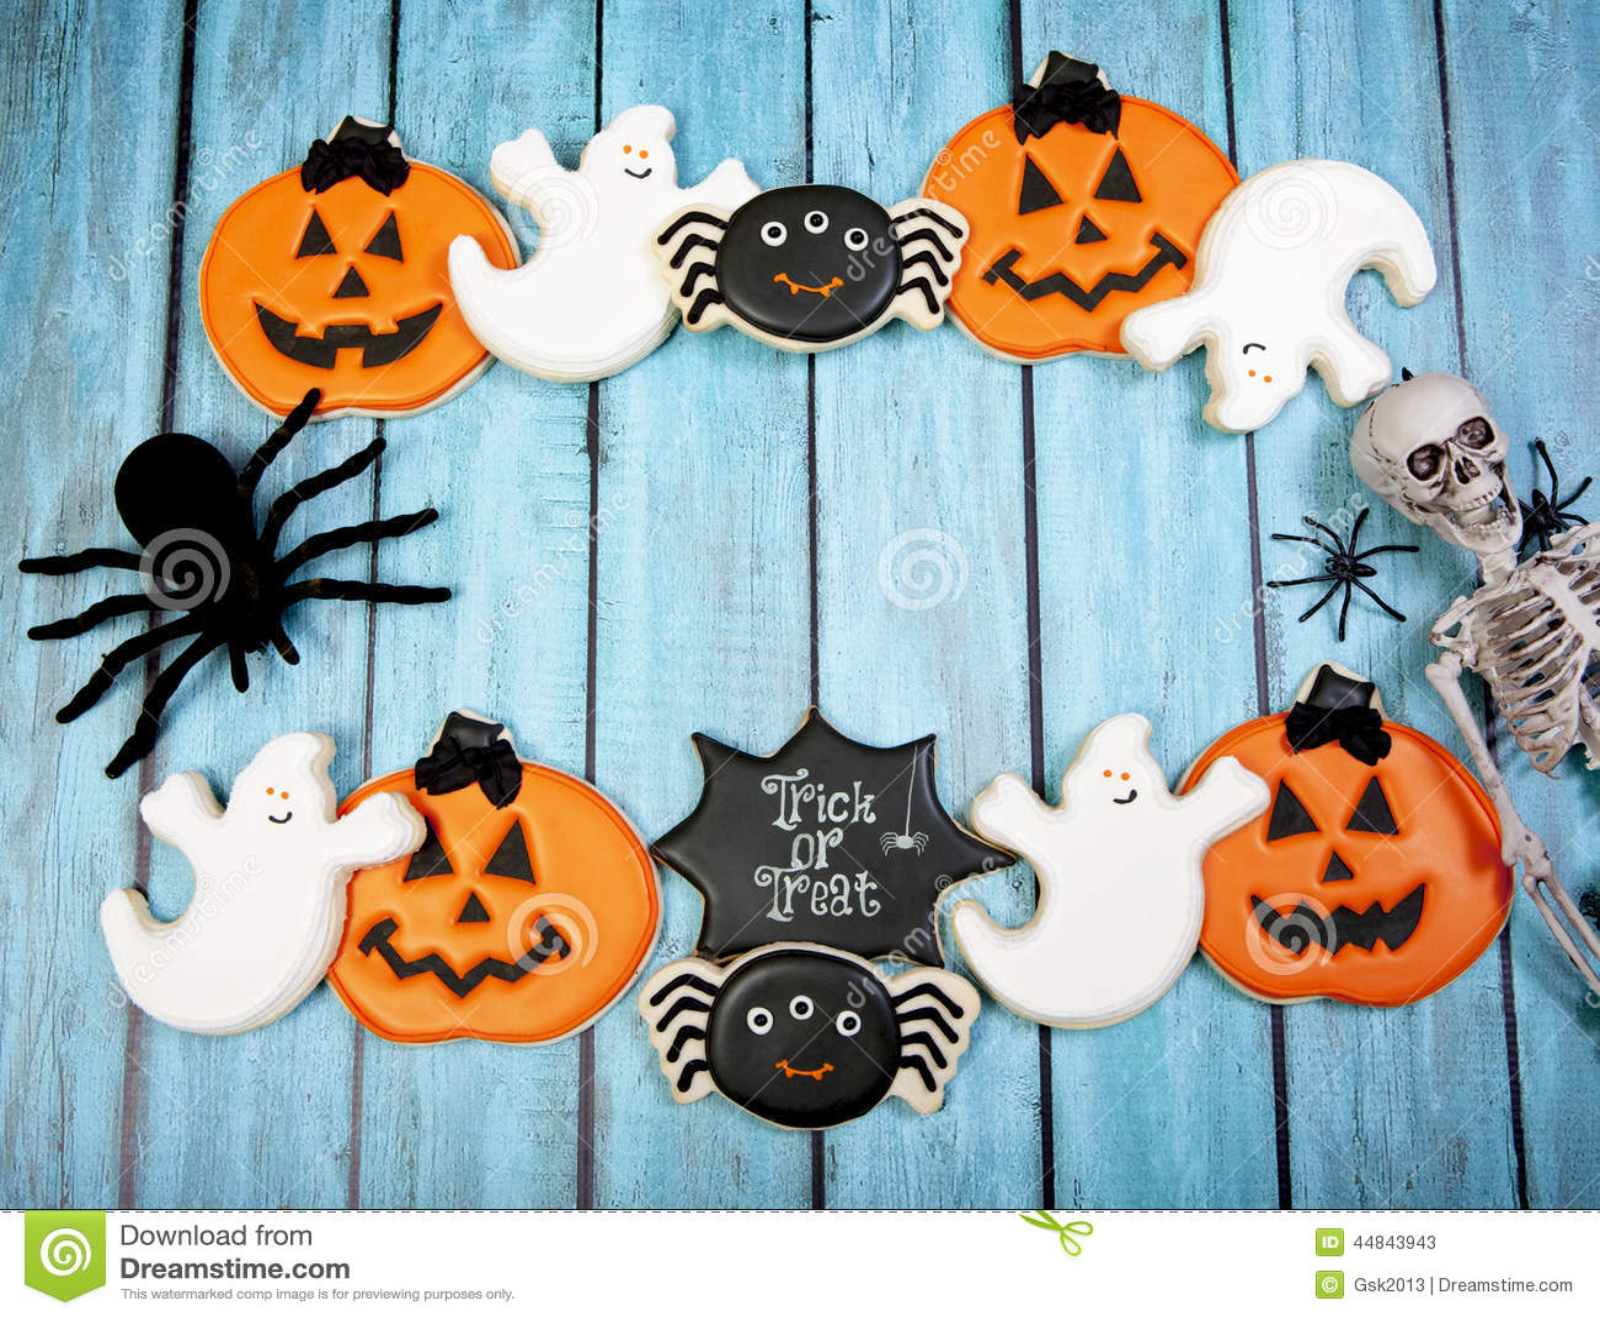 Halloween Cookies Background Stock Image - Image of spider ...